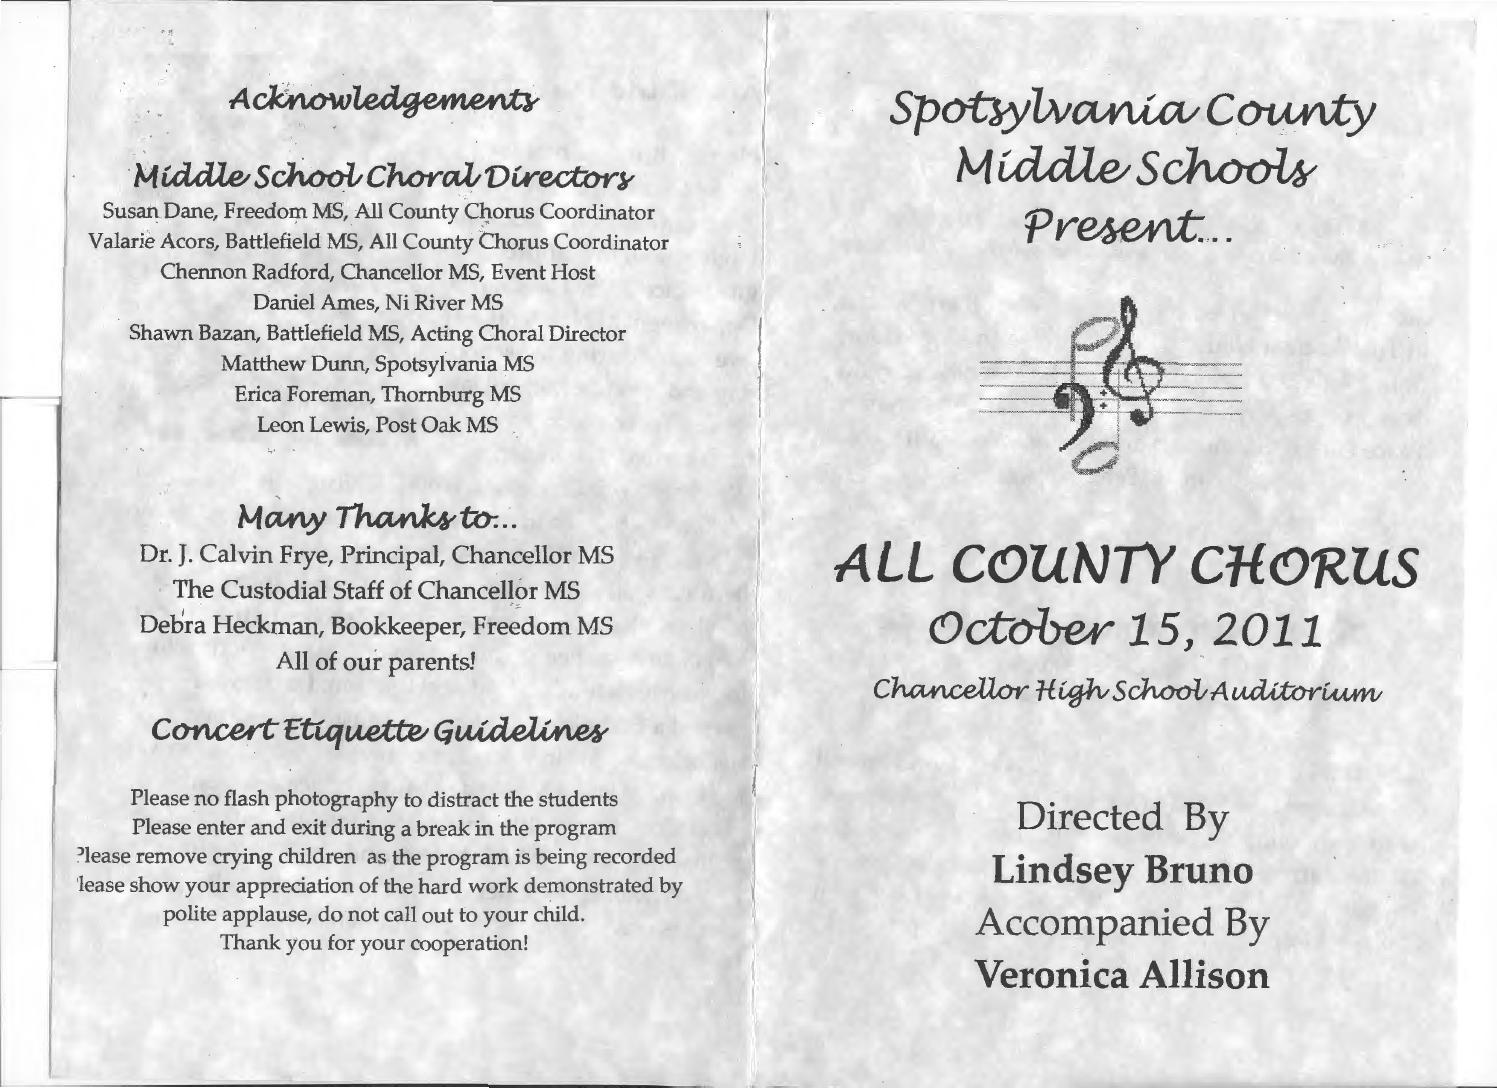 Spotsylvania all county choir program page 1 by Lindsey